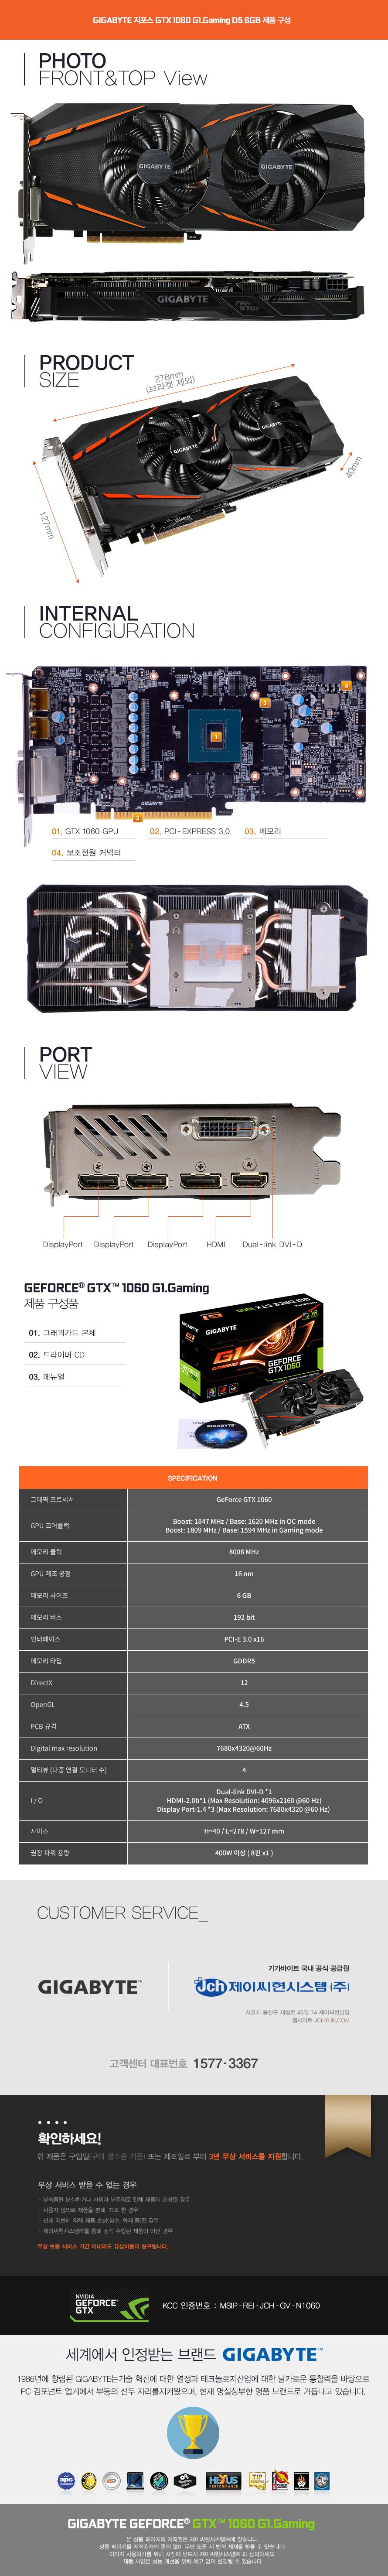 GTX 1060 G1.Gaming D5 6GB, 기가바이트, GIGABYTE, 제이씨현시스템